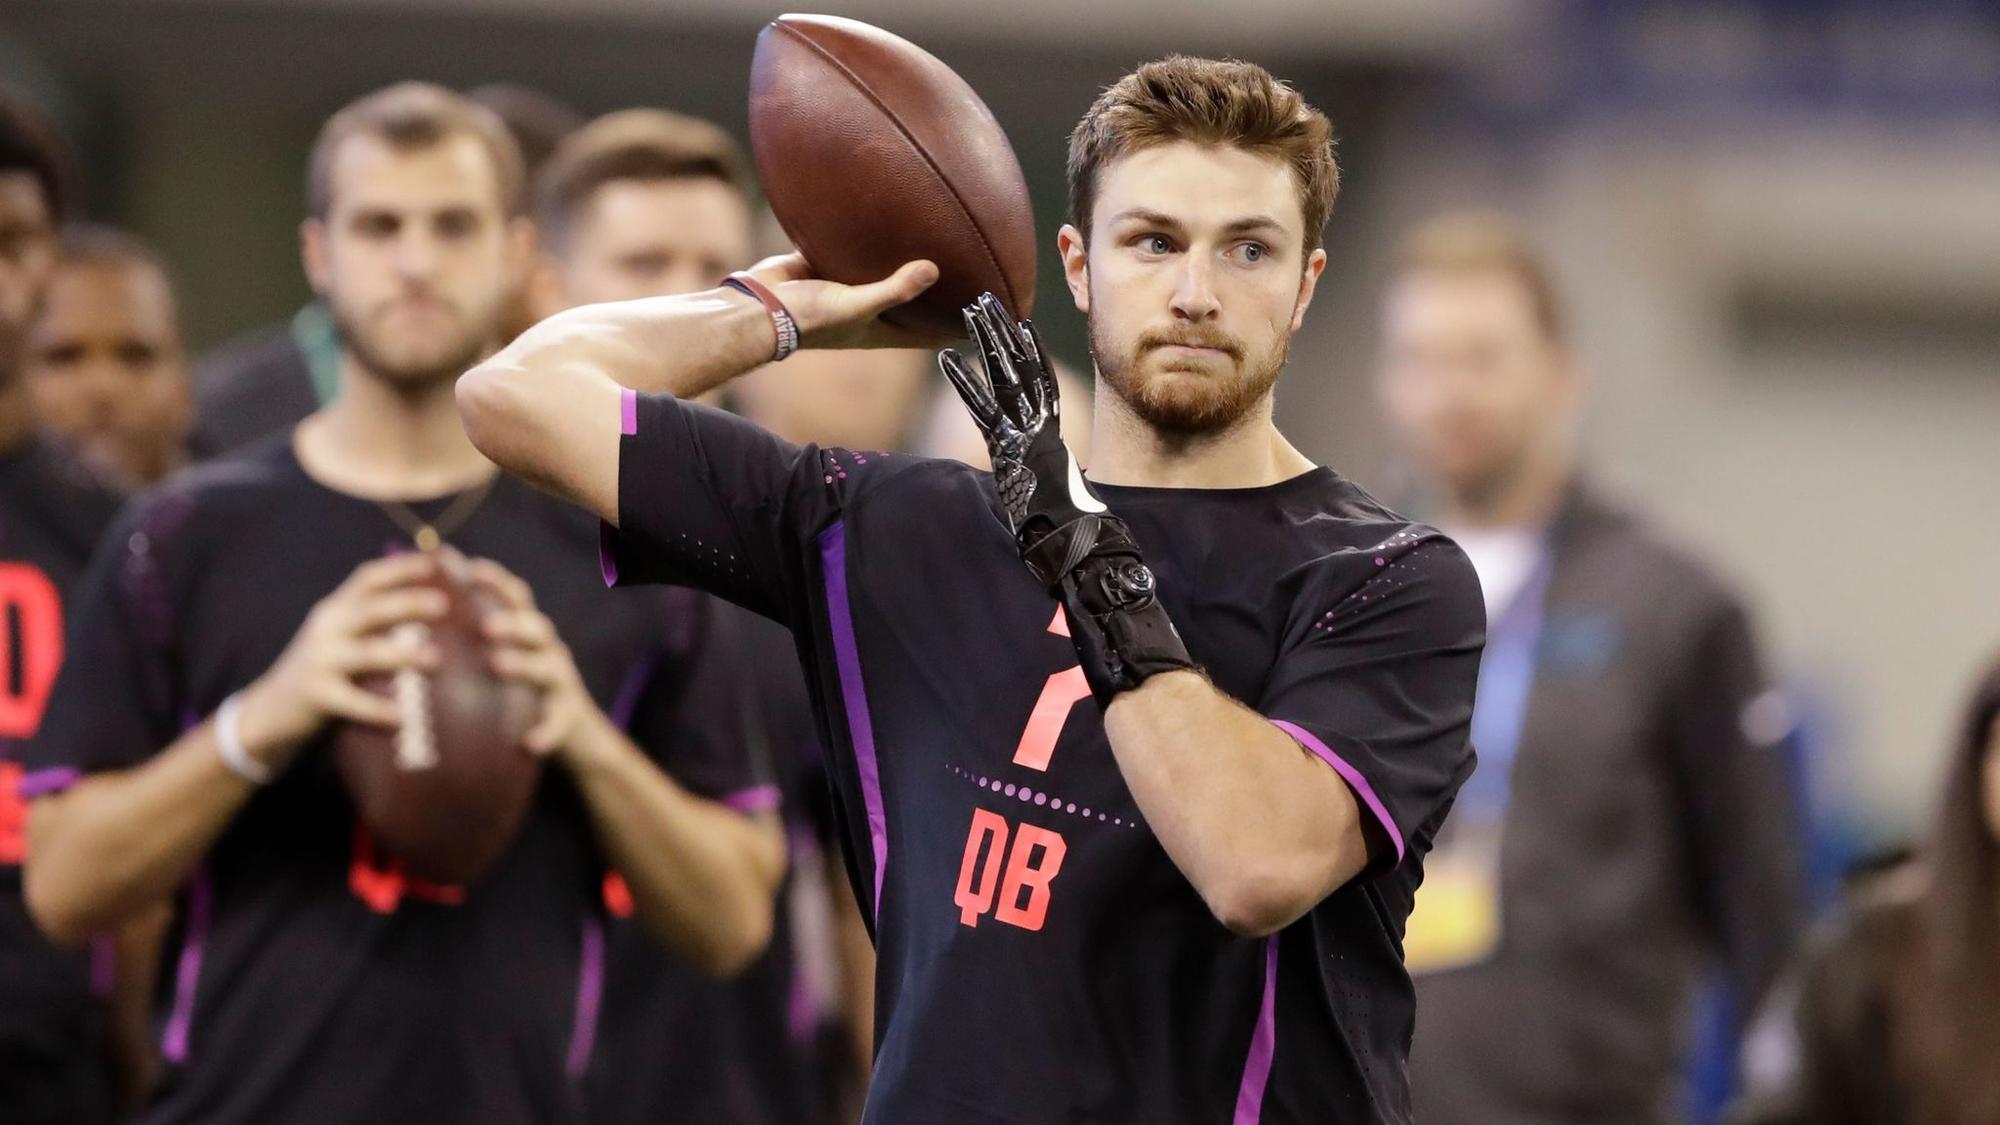 Bs-sp-ravens-quarterback-draft-20180304